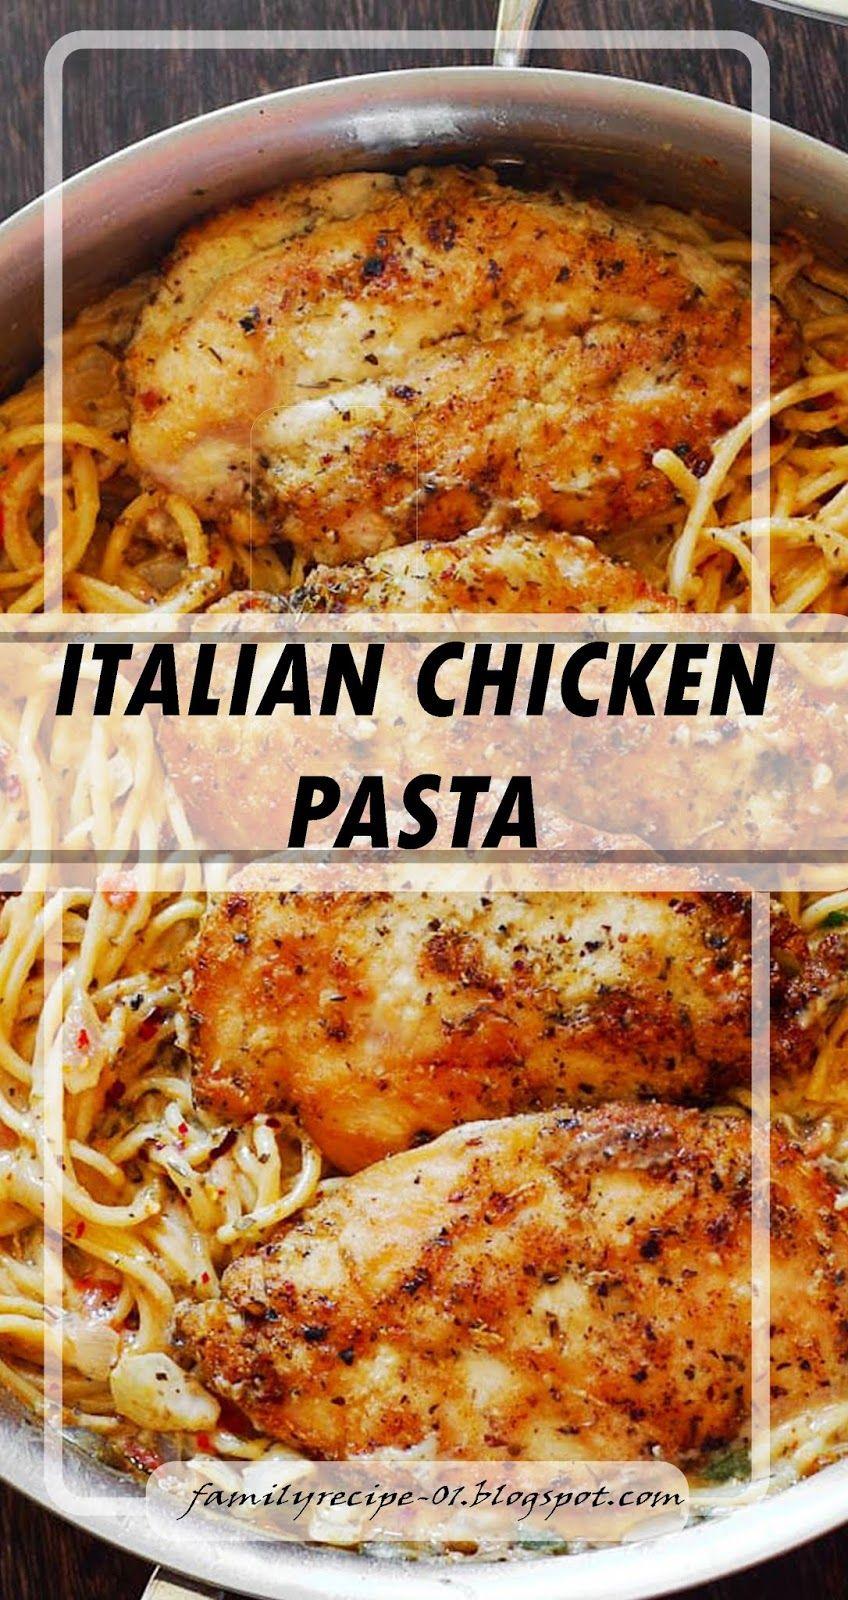 Italian Chicken Pasta Beembloo Com Italian Chicken Recipes Italian Chicken Pasta Italian Chicken